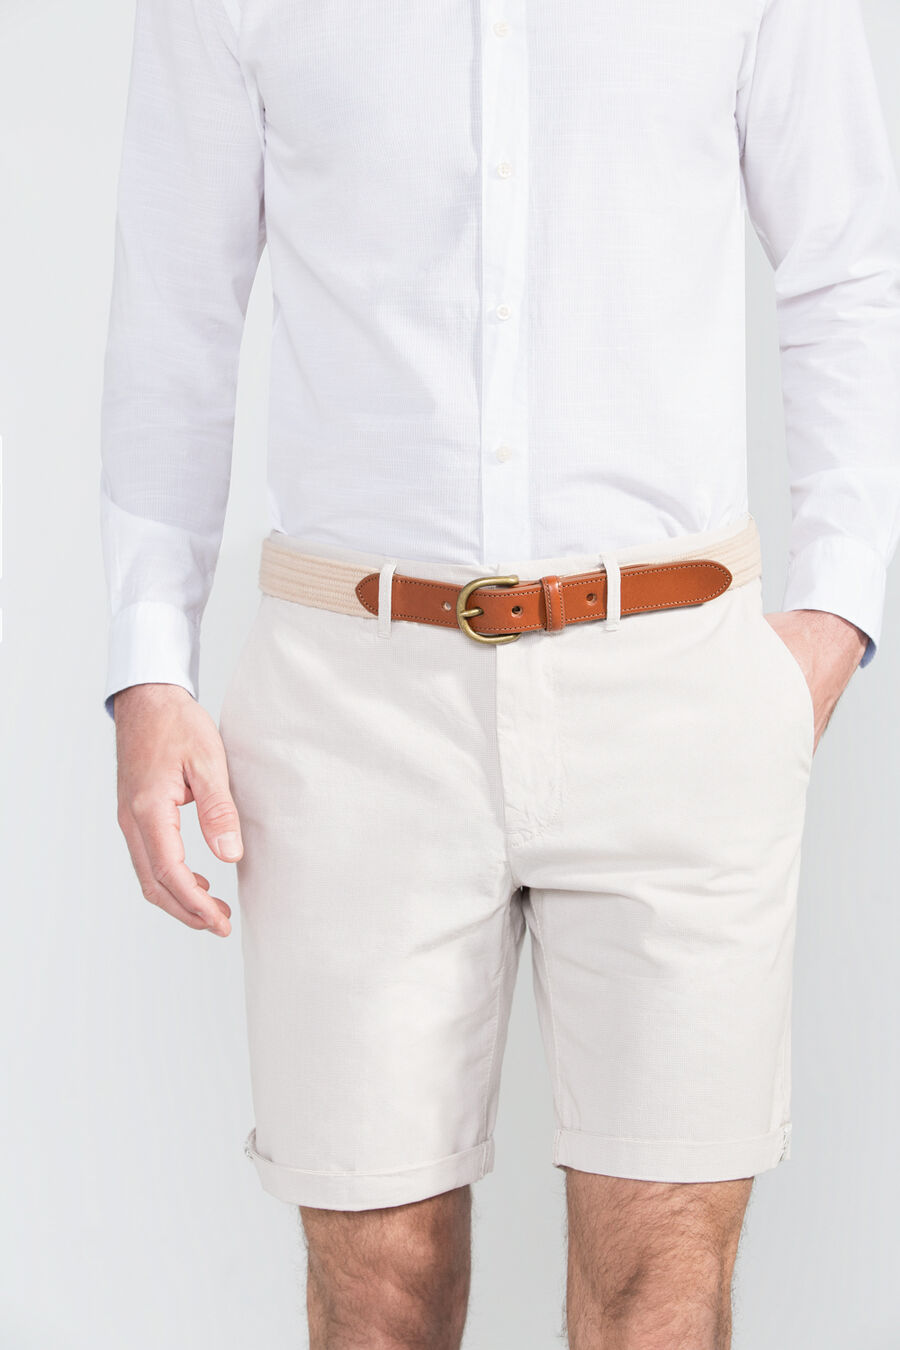 Tailored fit bermuda shorts